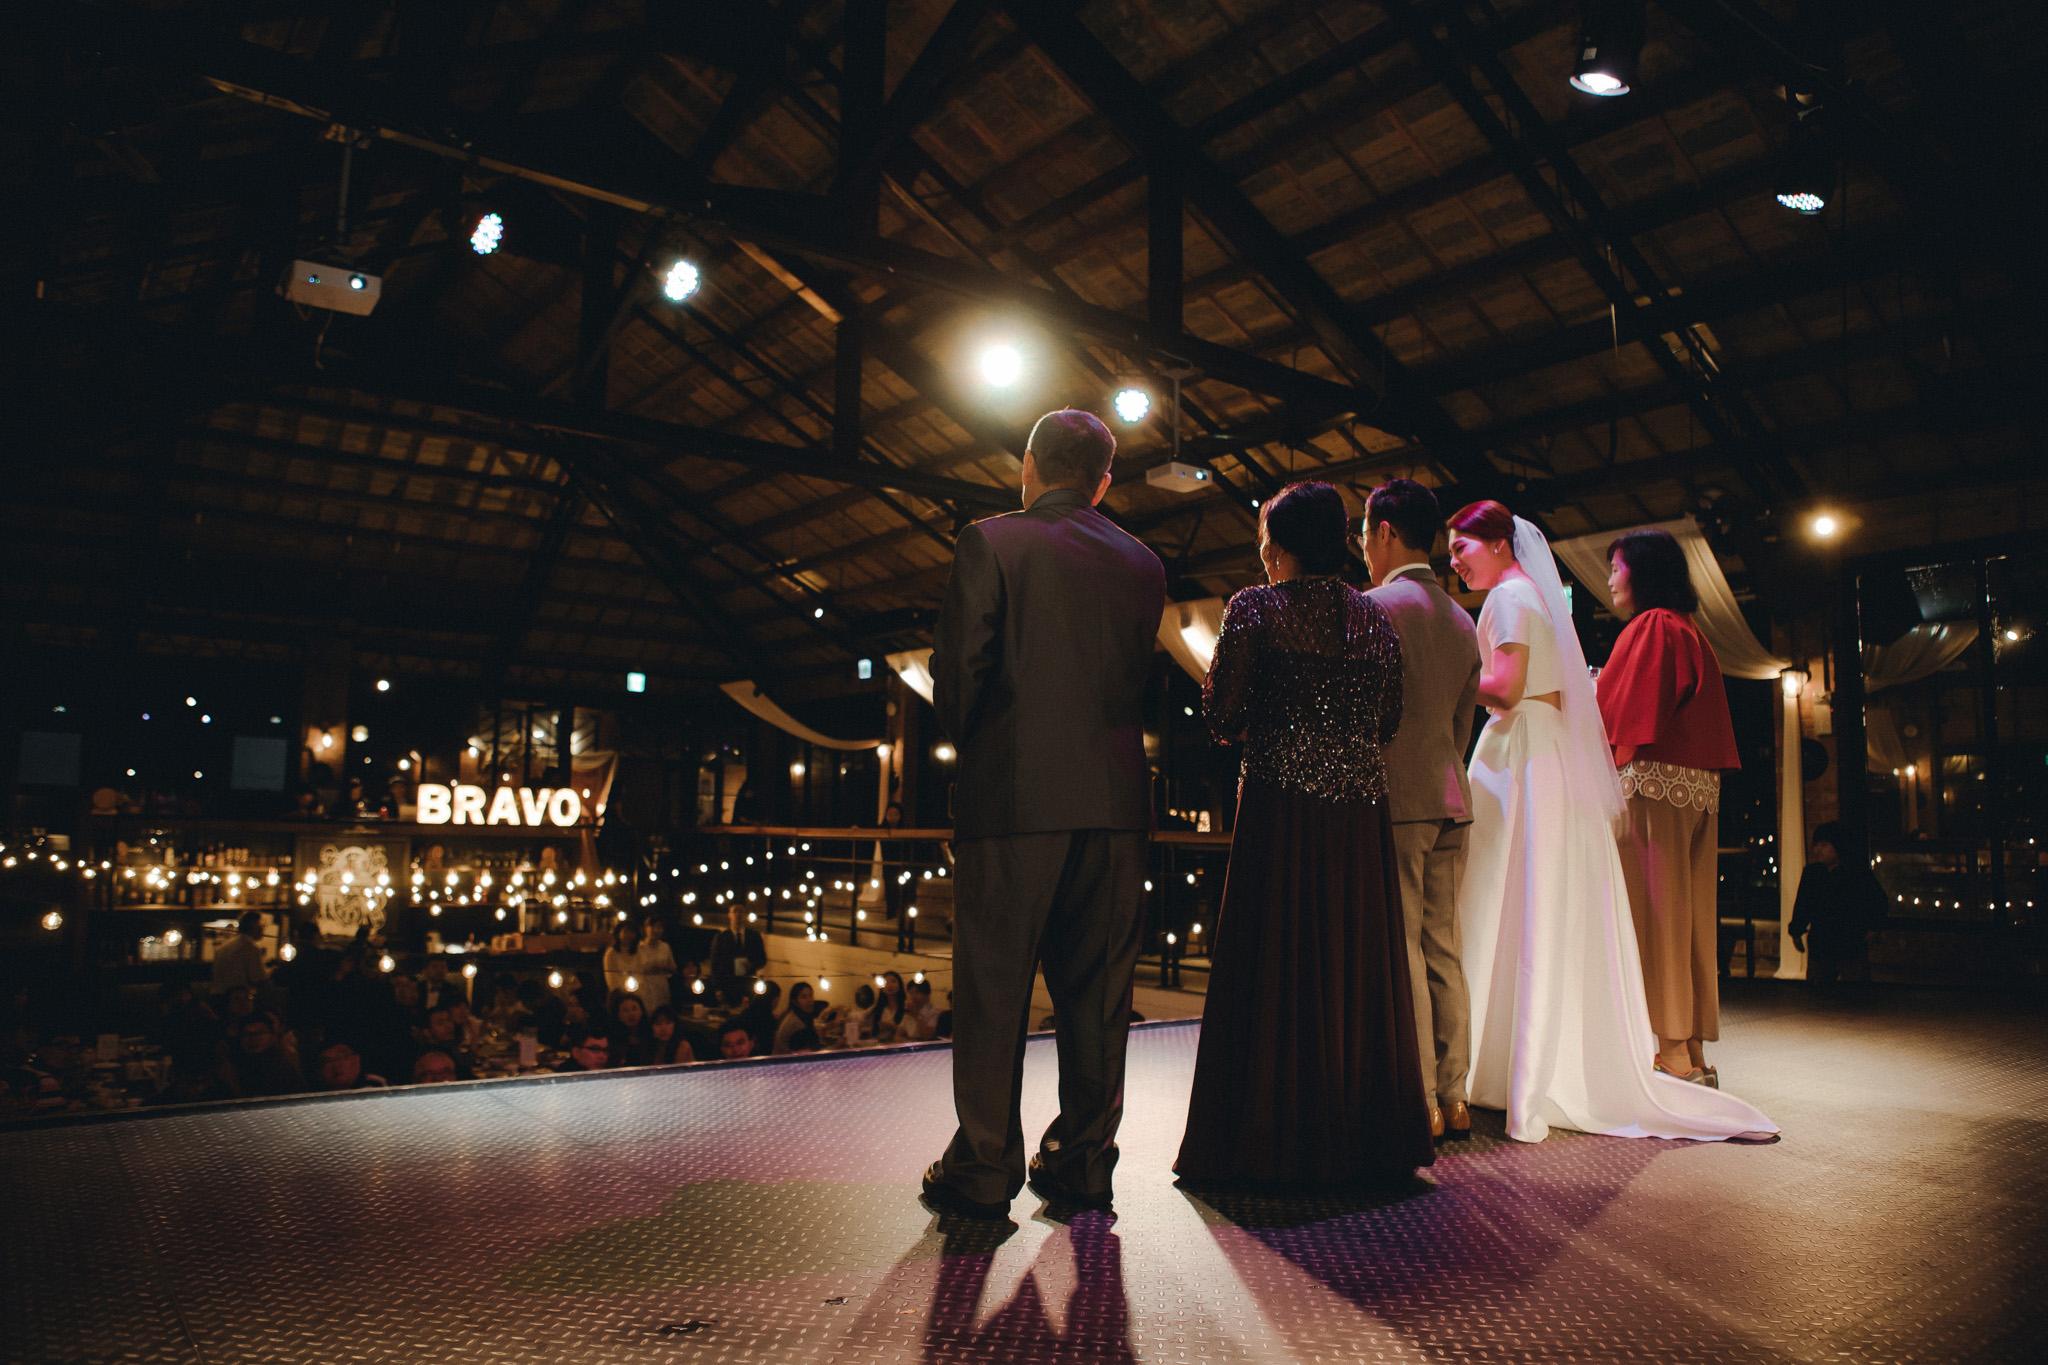 EW 台北婚攝 居米 濟南教會 Brick Yard 33 美軍俱樂部 婚禮 婚宴-82